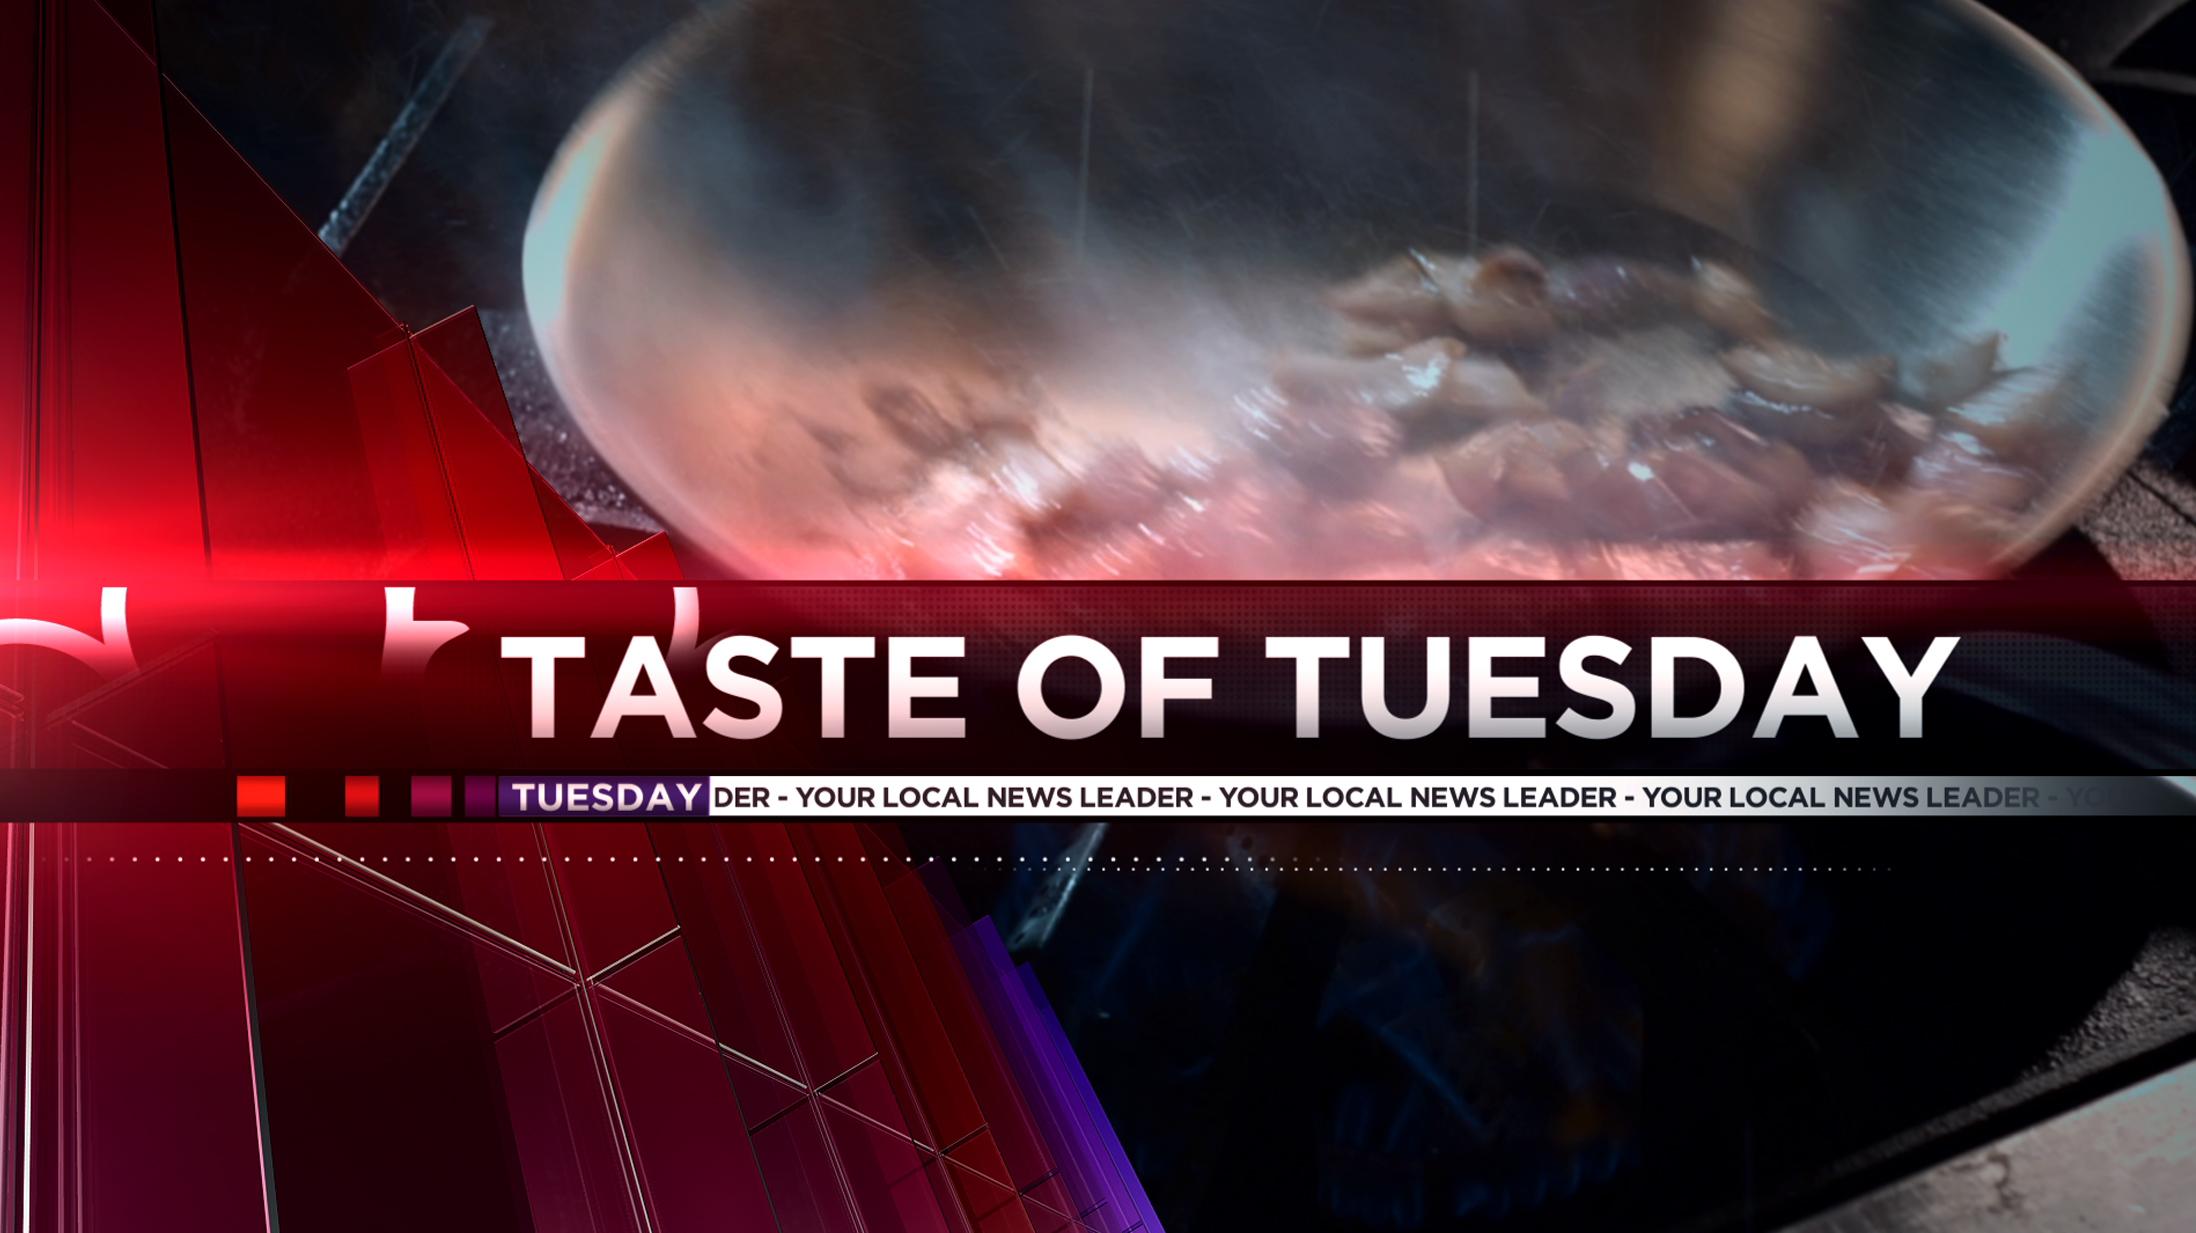 Taste Of Tuesday_1445380394543.jpg